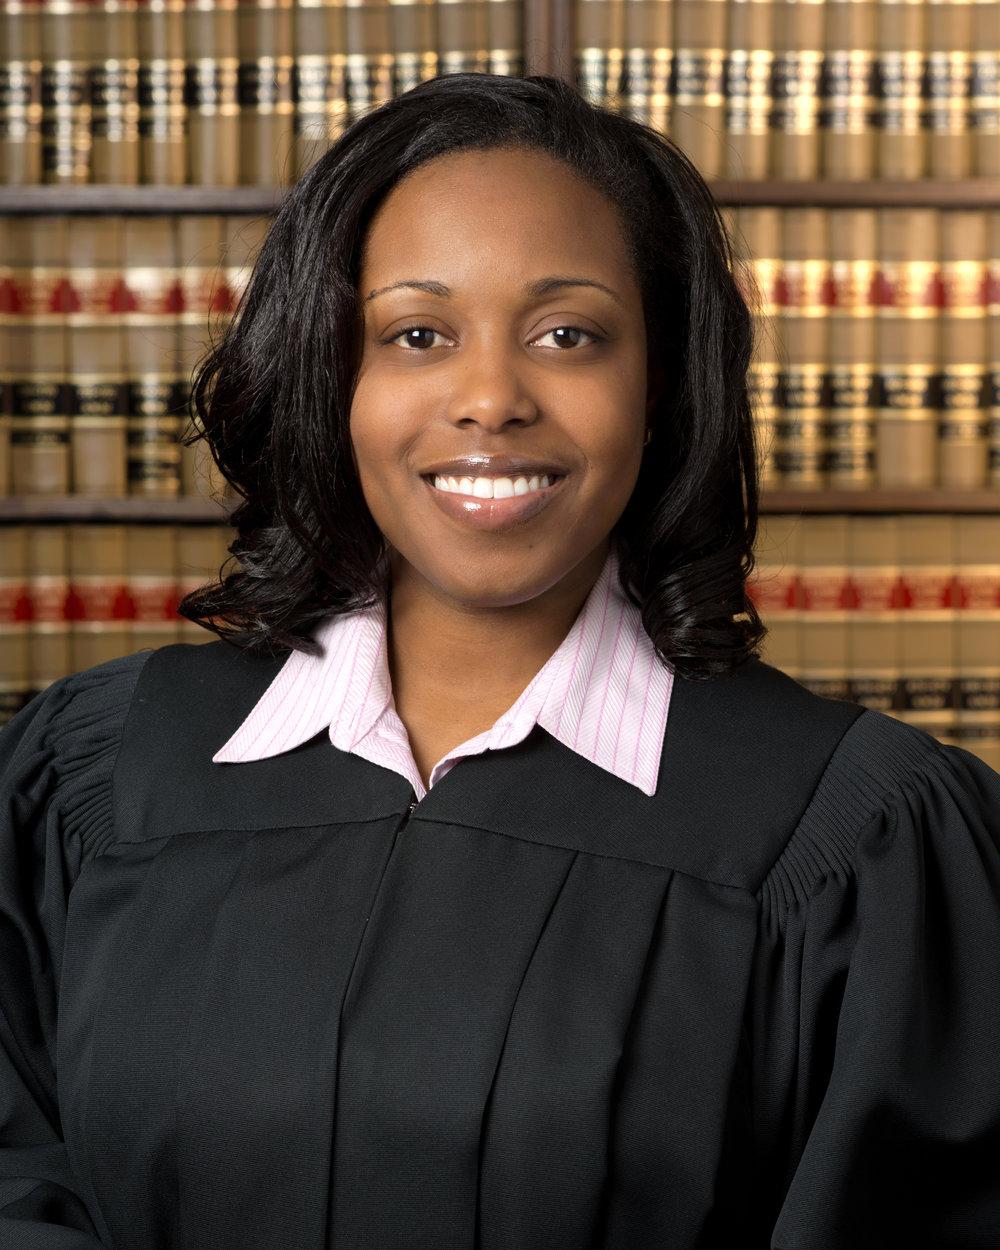 Photo - Judge Otto.jpg